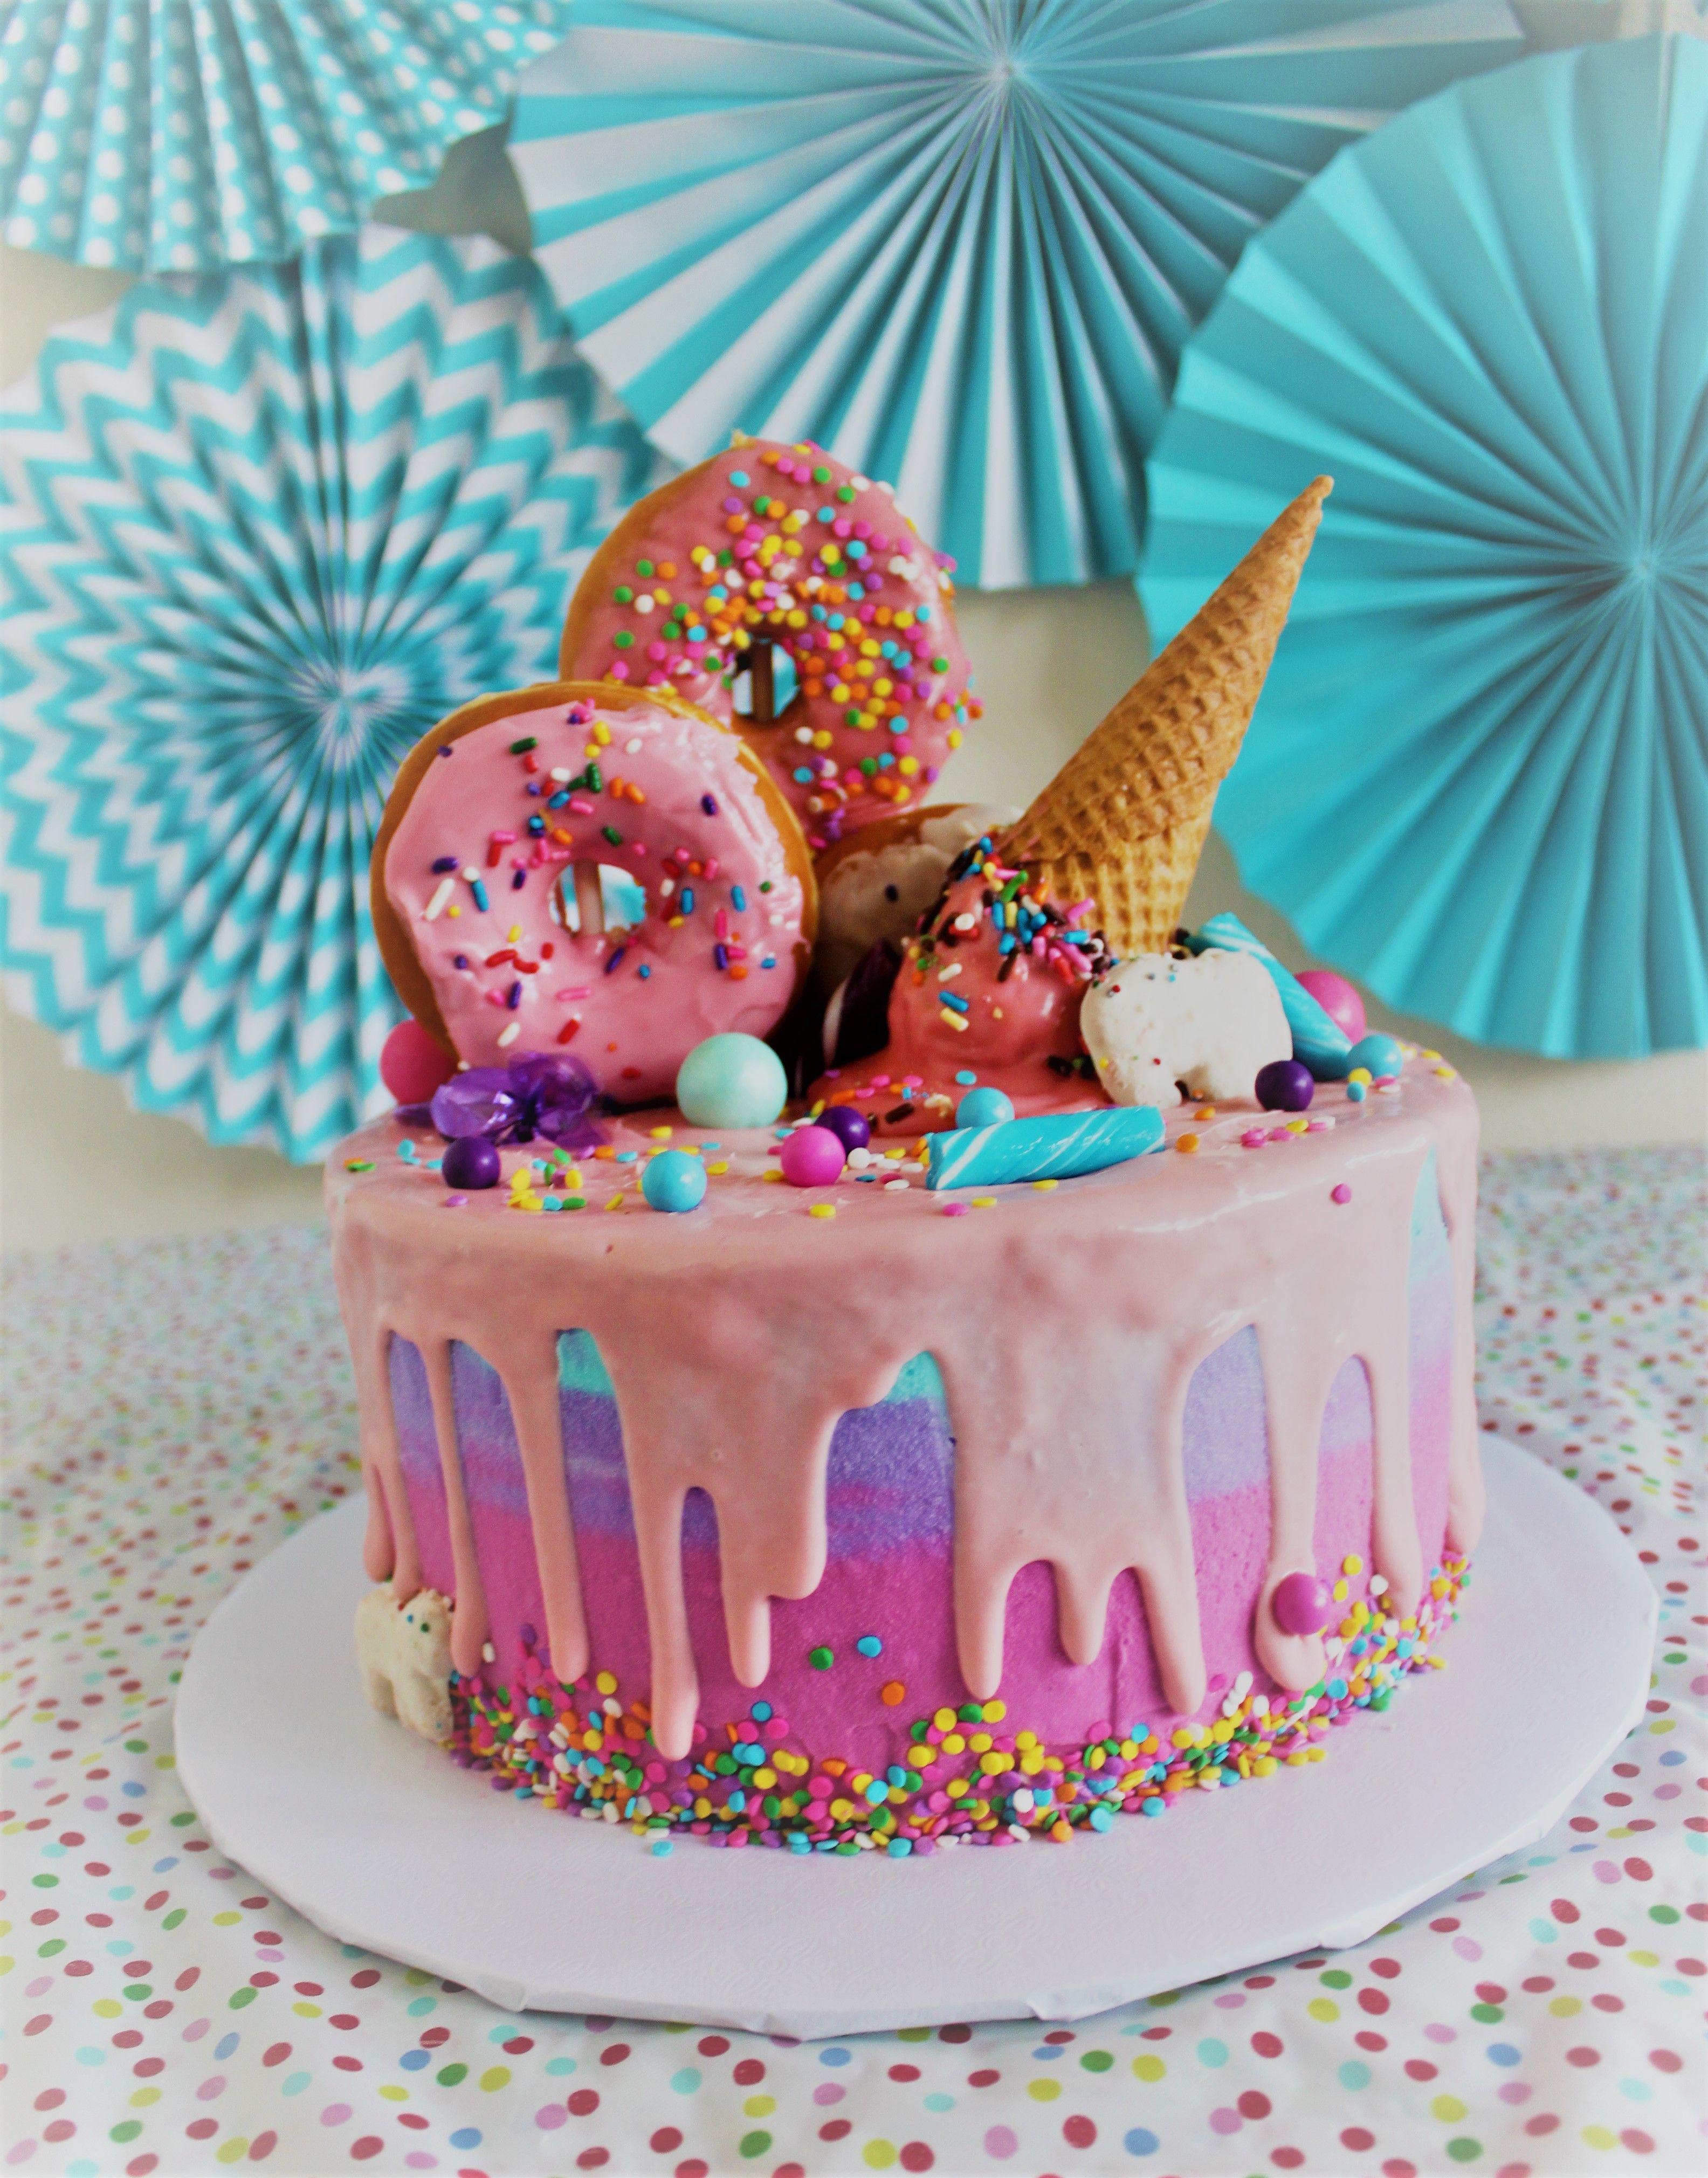 Make this fun and whimsical Salted Caramel Ice Cream Cake recipe